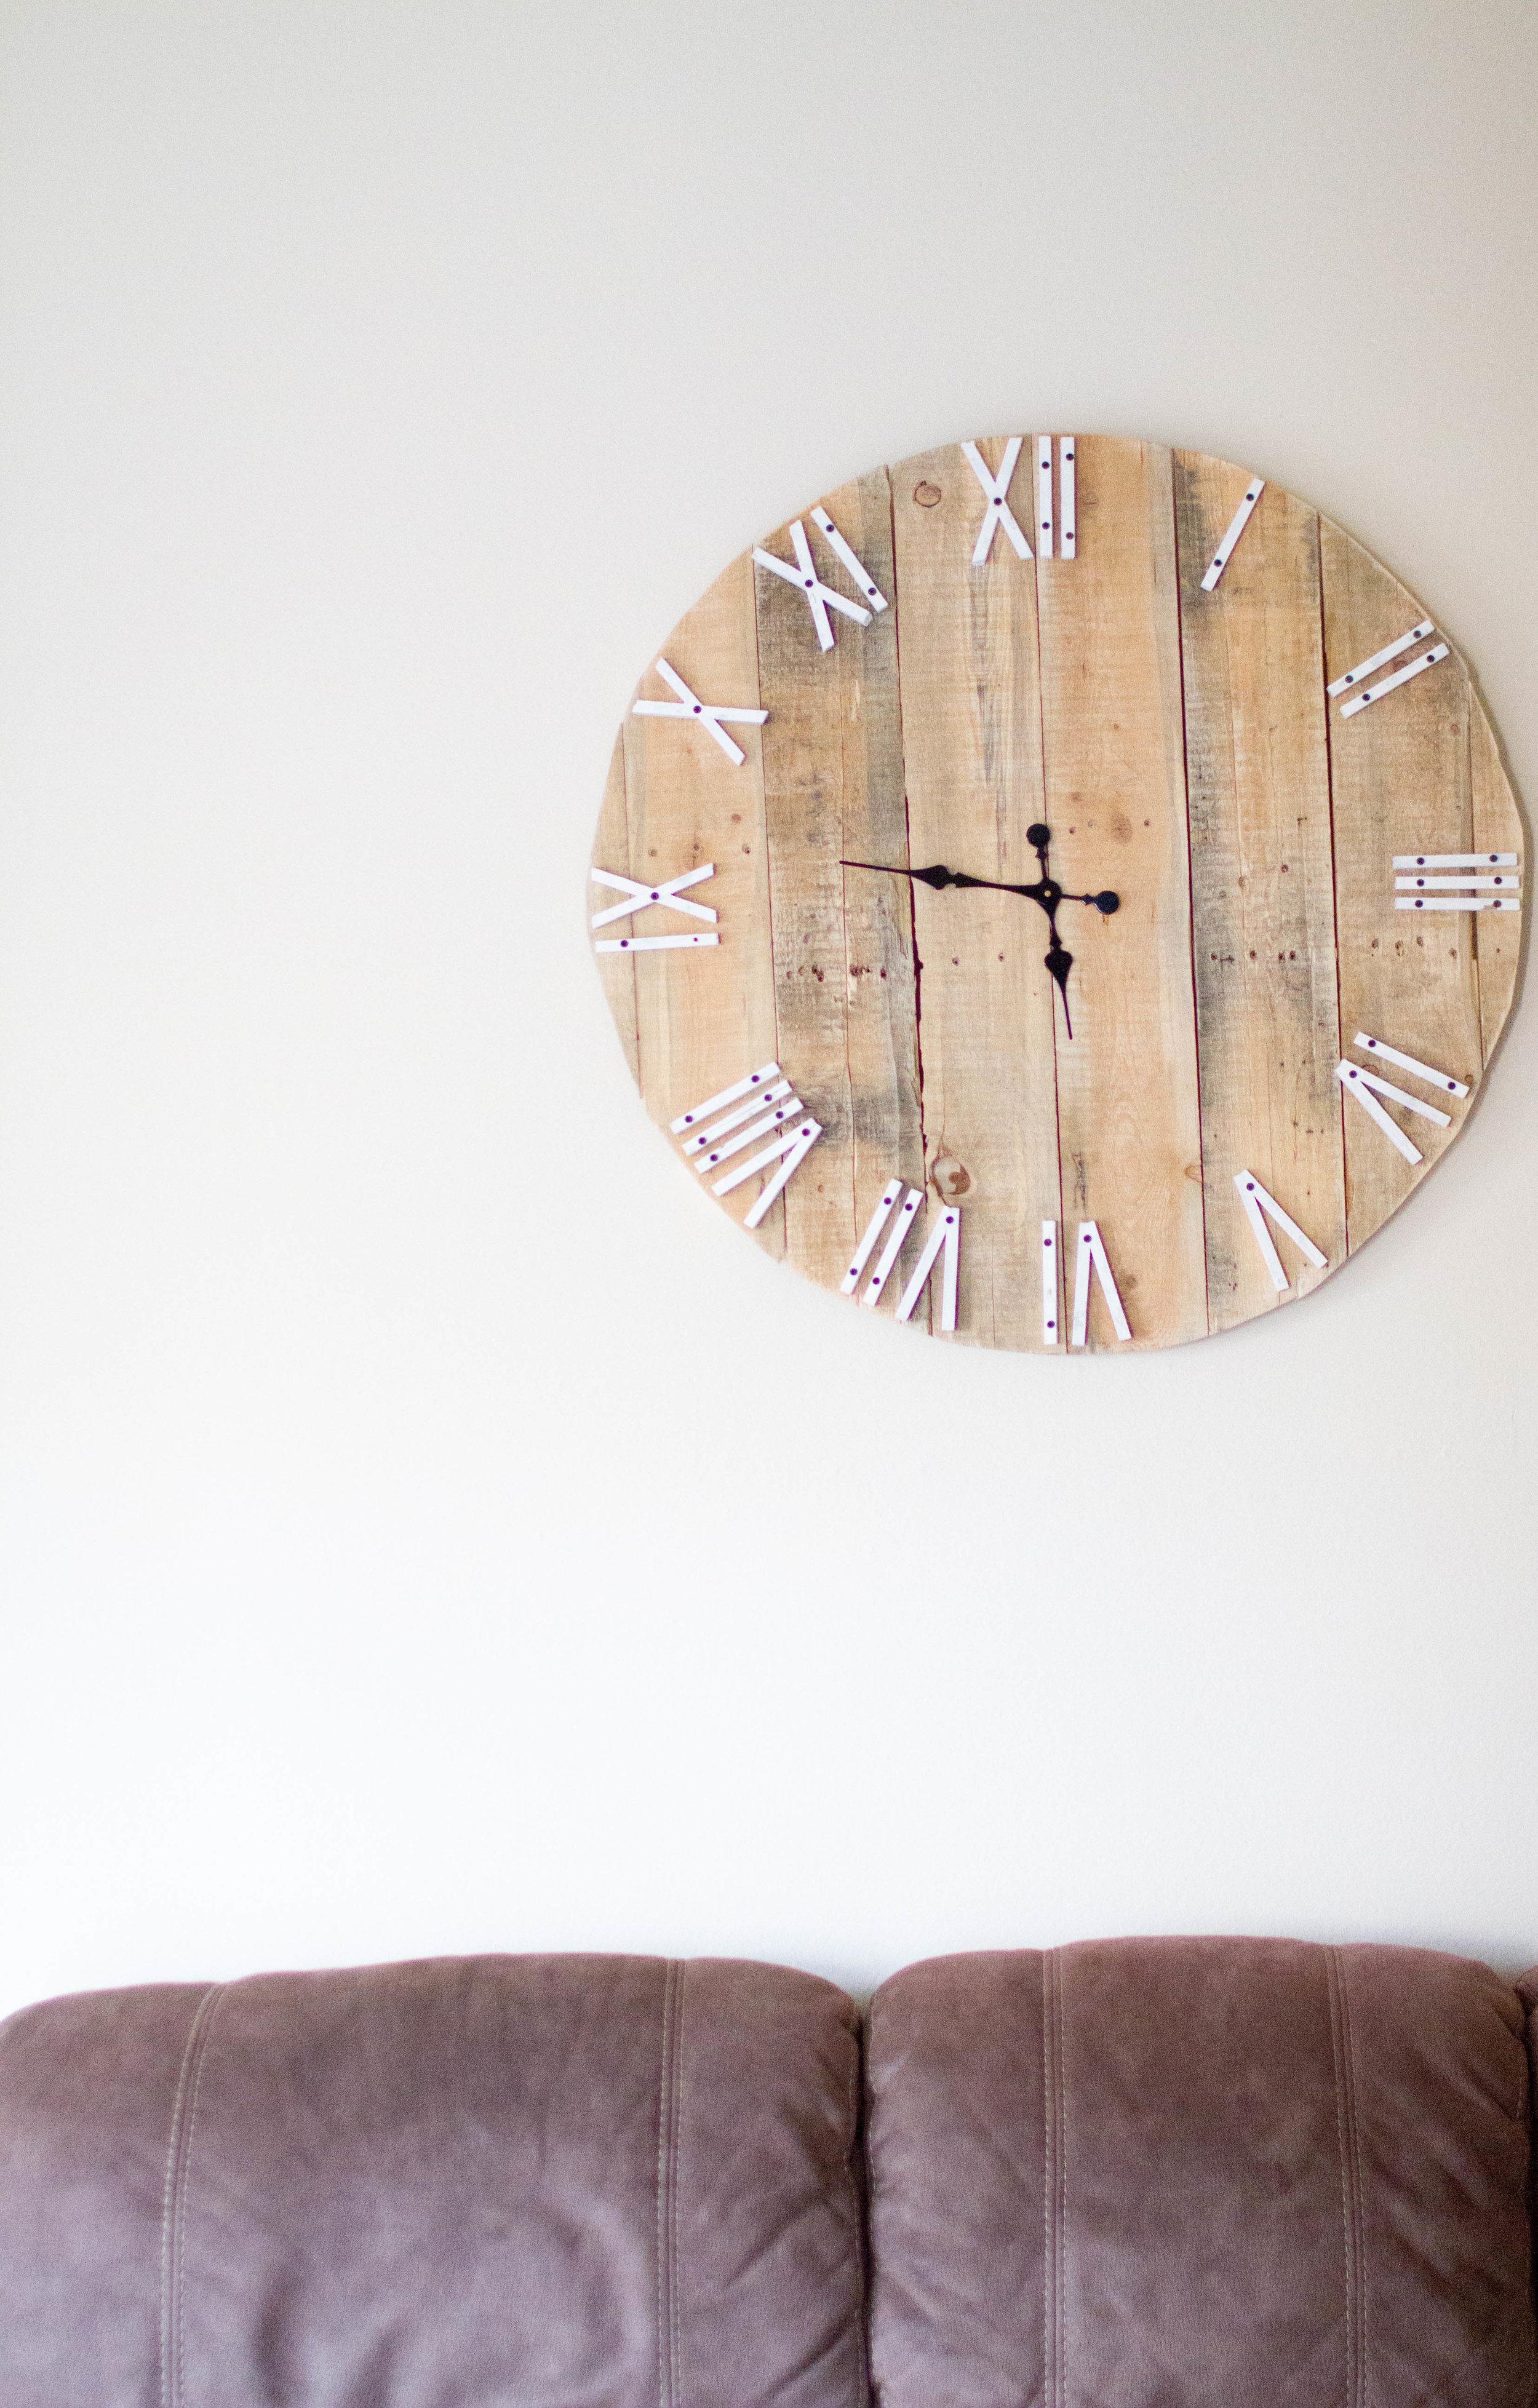 Shop similar Etsy clock  HERE  for $100